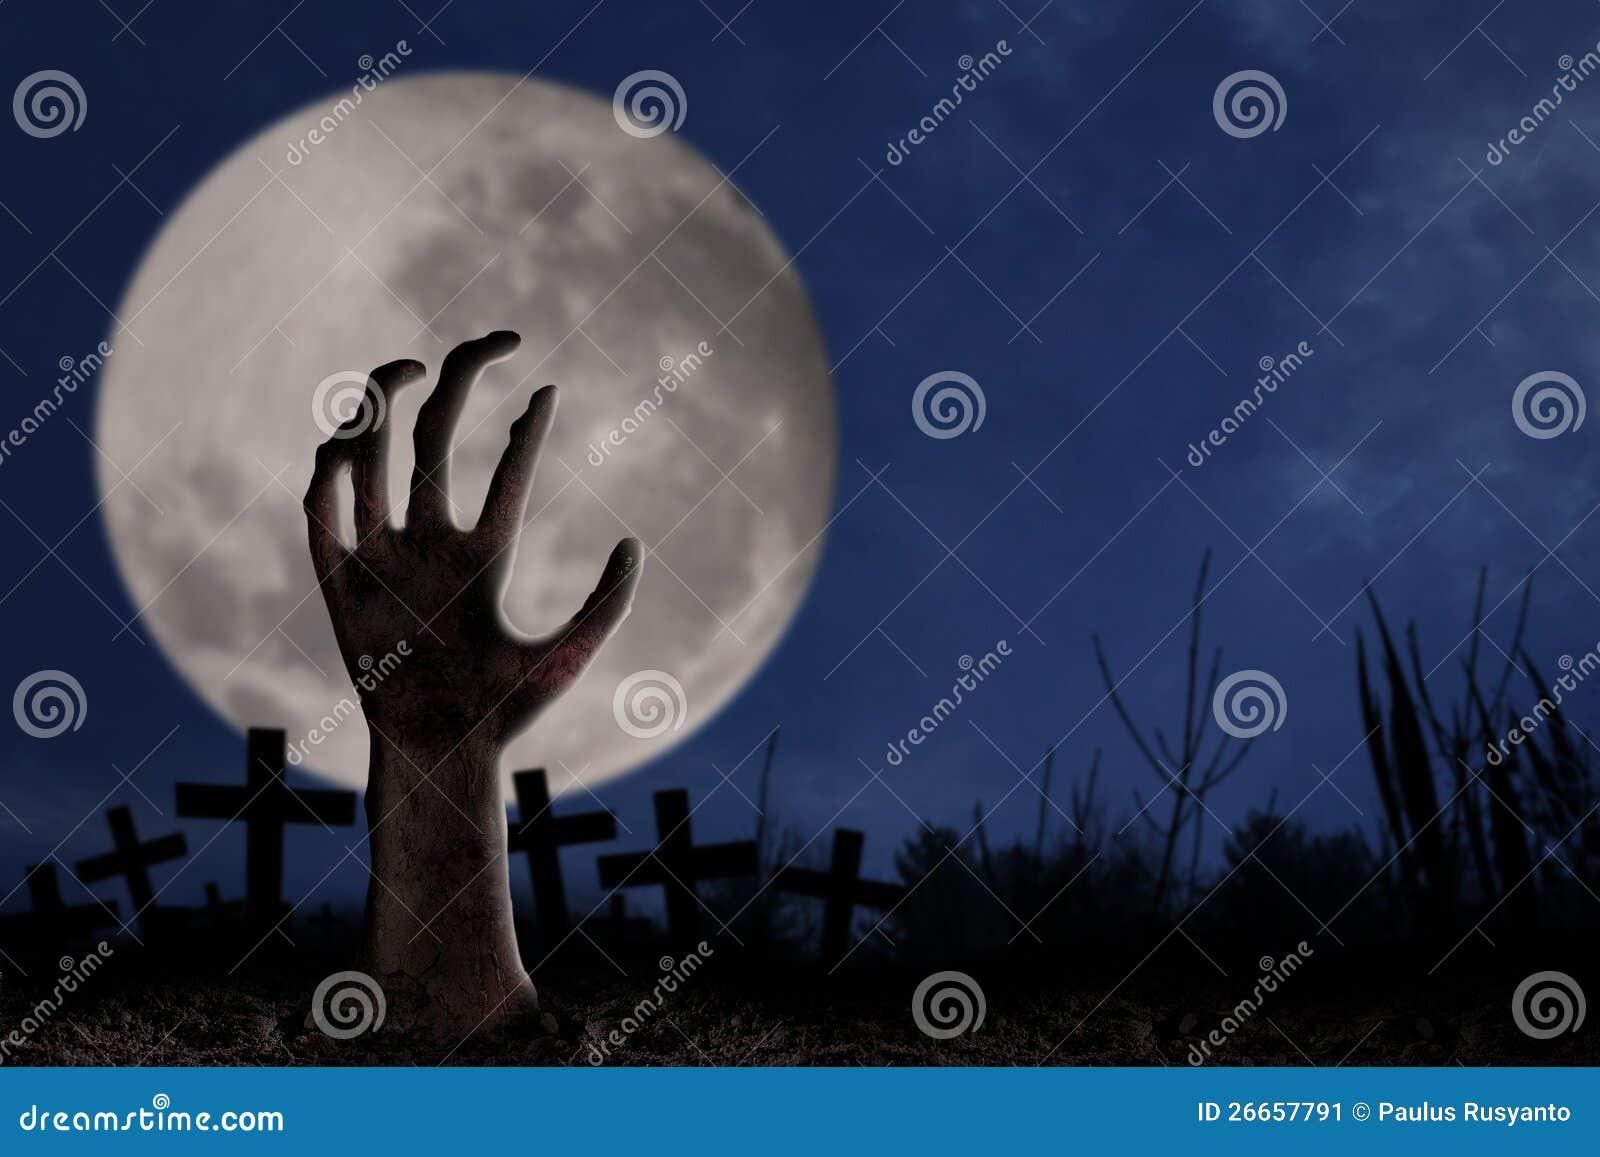 Zombie hand on graveyard